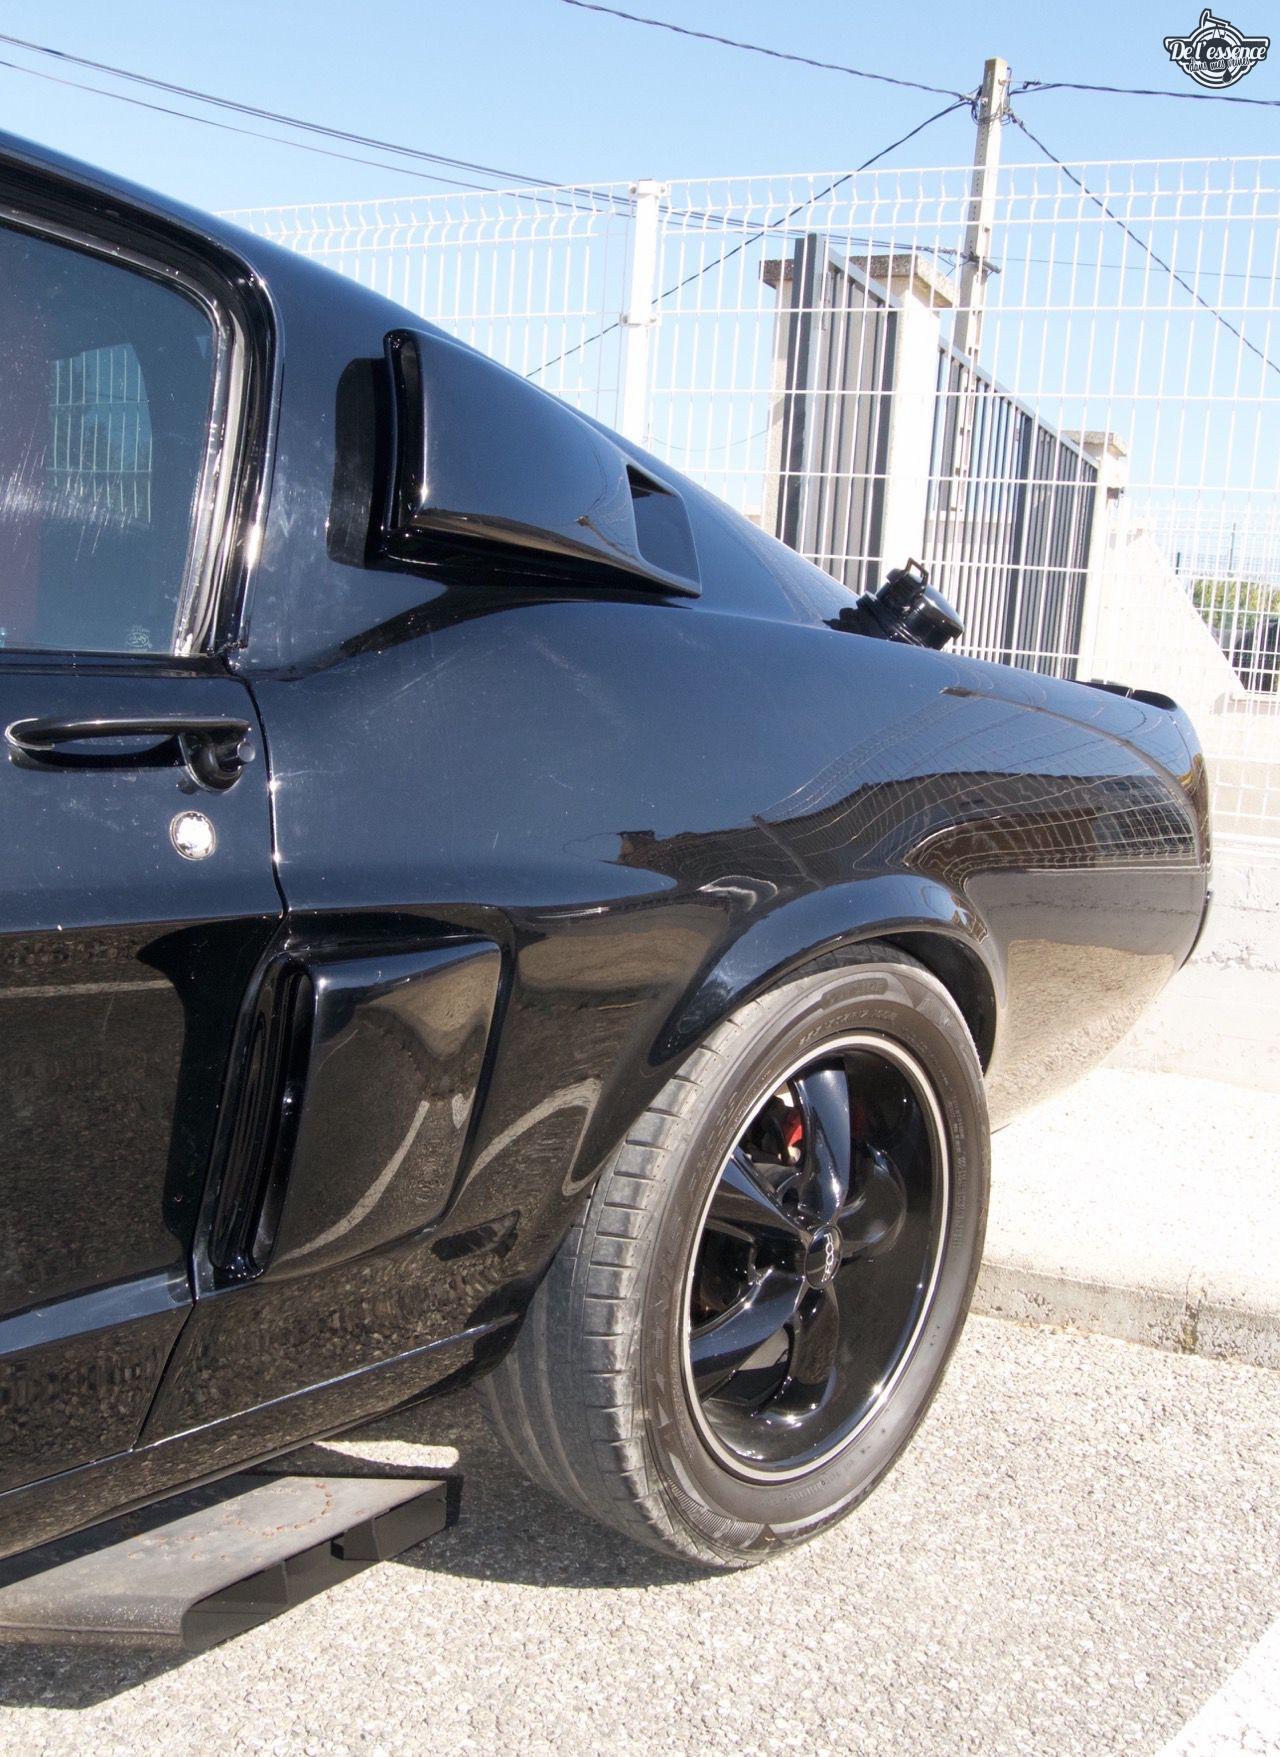 '67 Ford Mustang Shelby GT500 Replica... Bienvenue en enfer ! 13